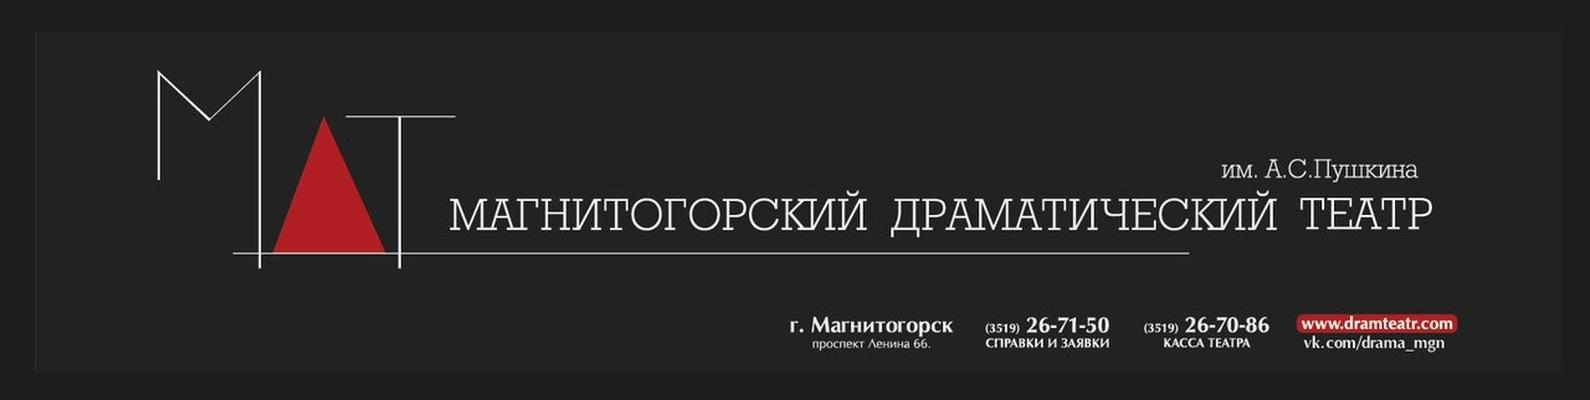 Театр пушкина магнитогорск афиша на октябрь сколько стоит билет на концерт little big